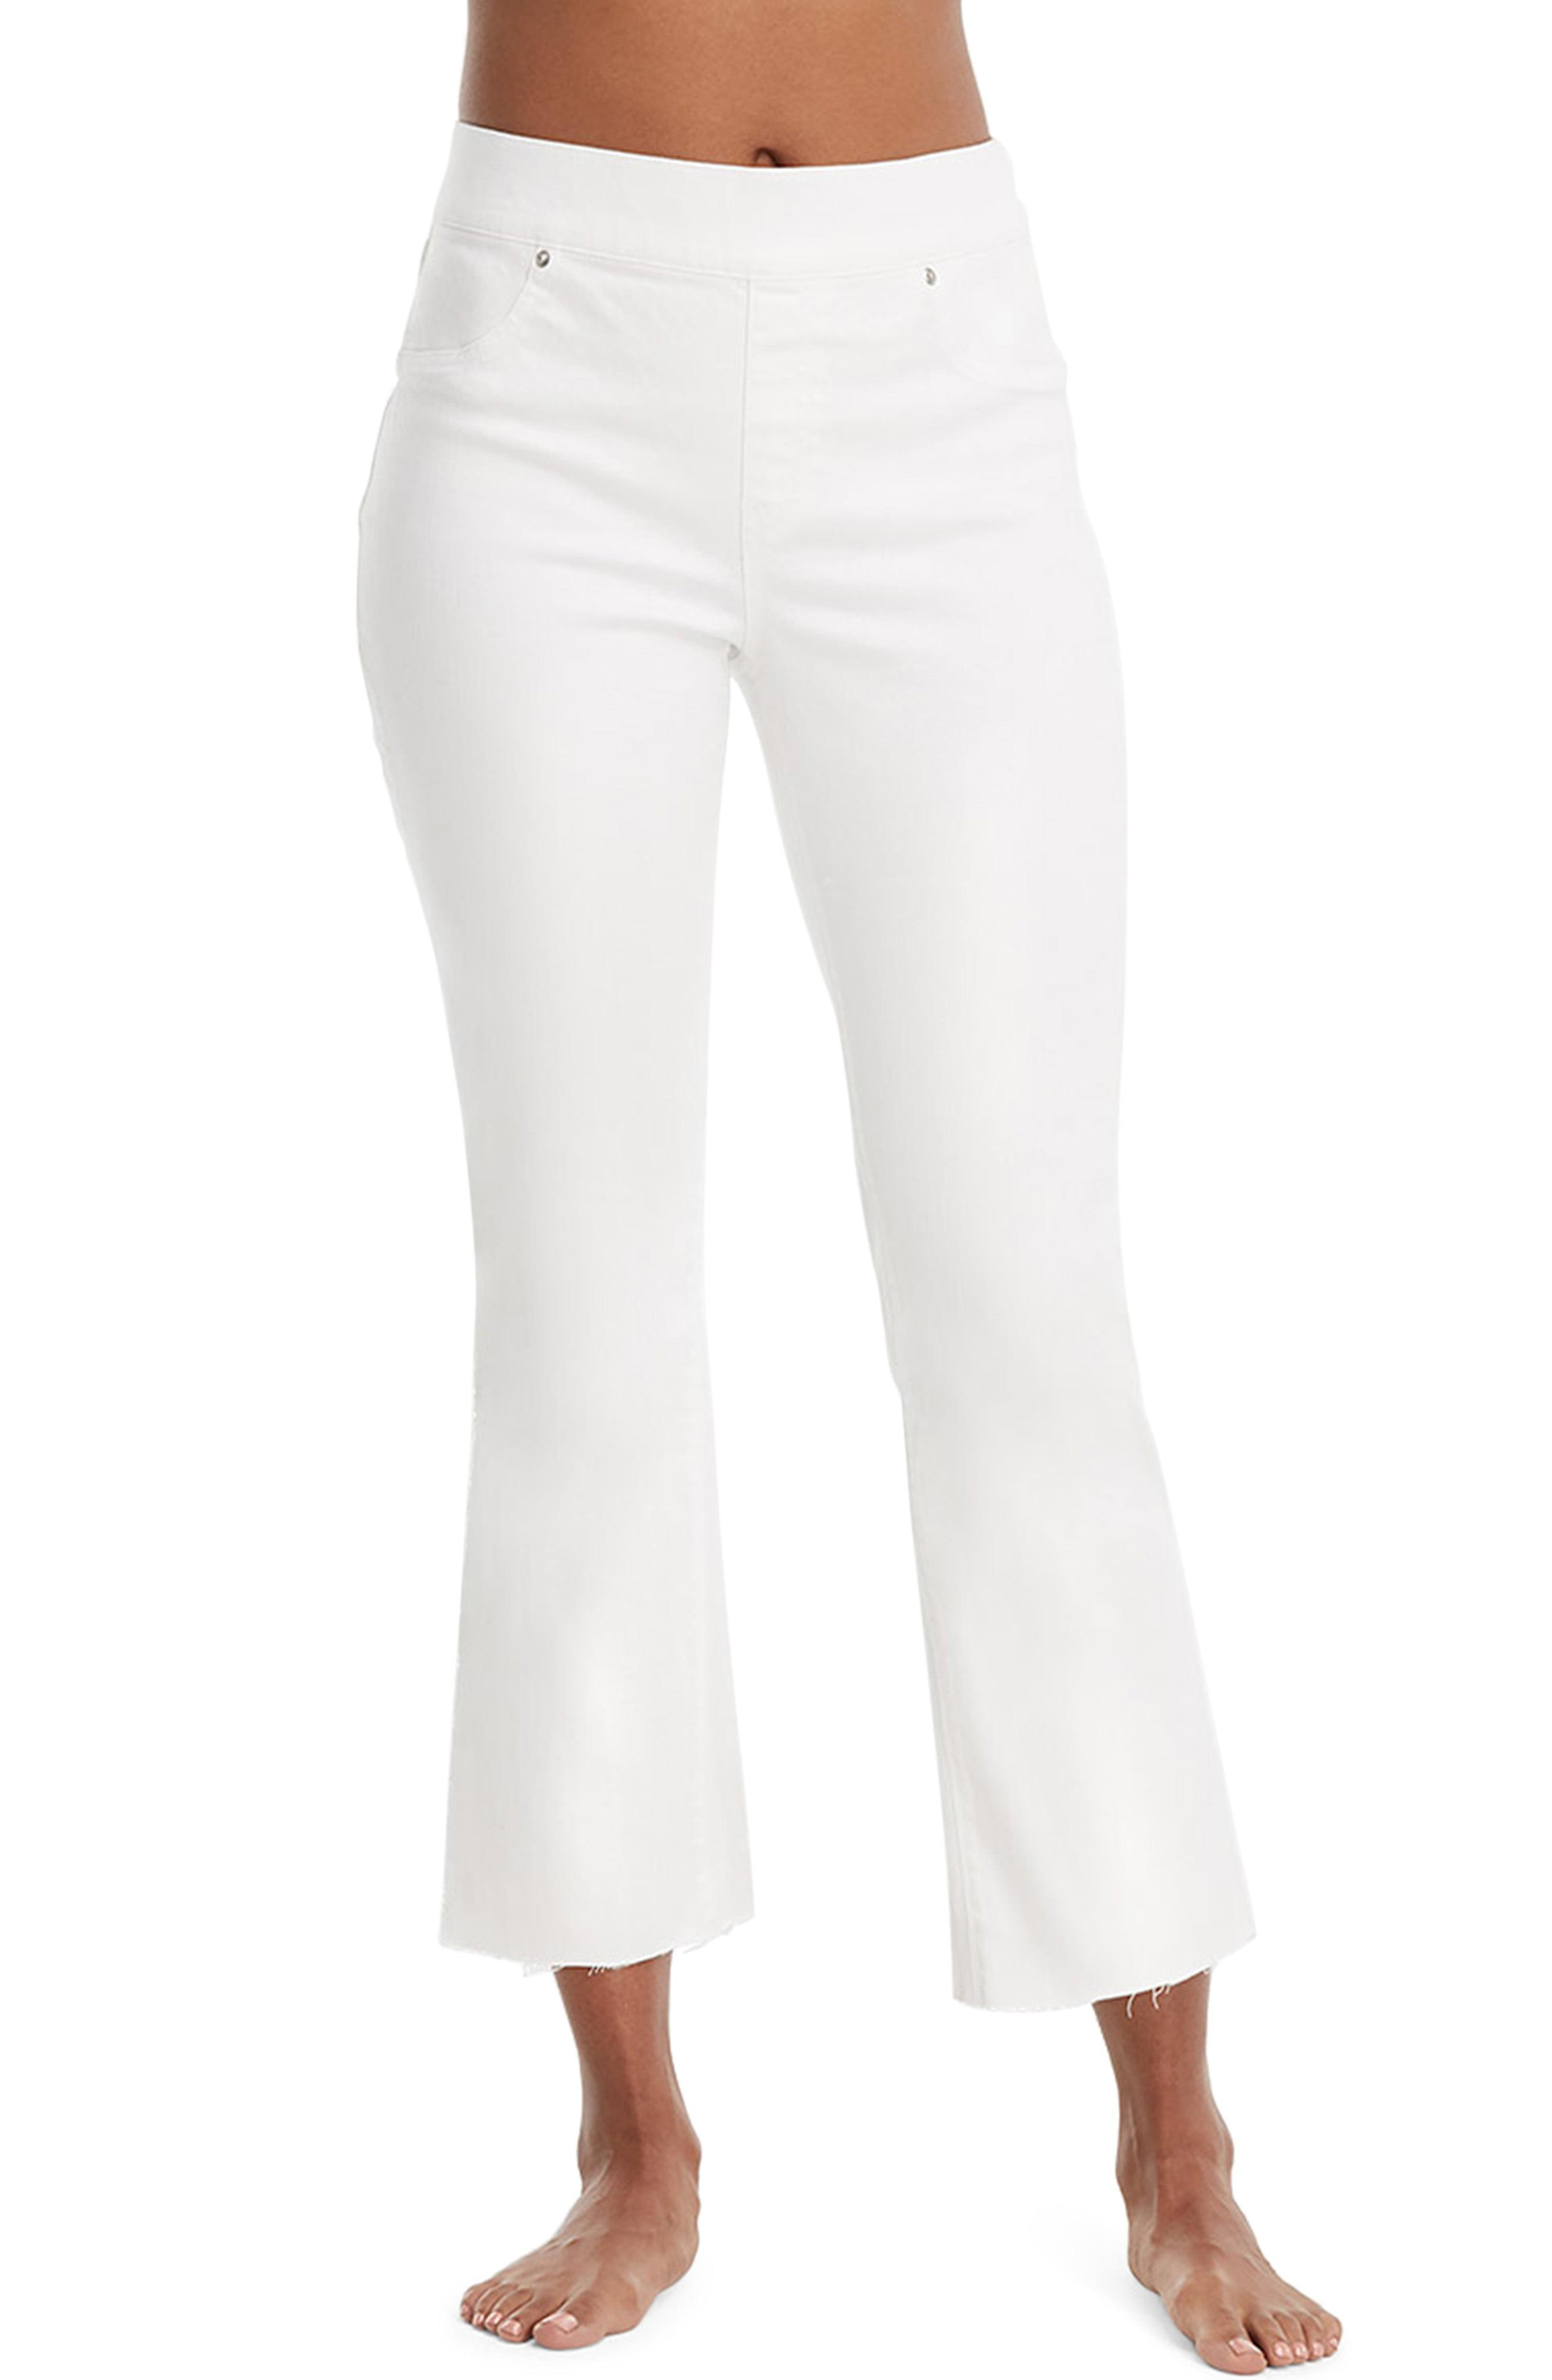 97c370bfa4e1c5 Lyst - Spanx Spanx Cropped Flare Denim Leggings in White